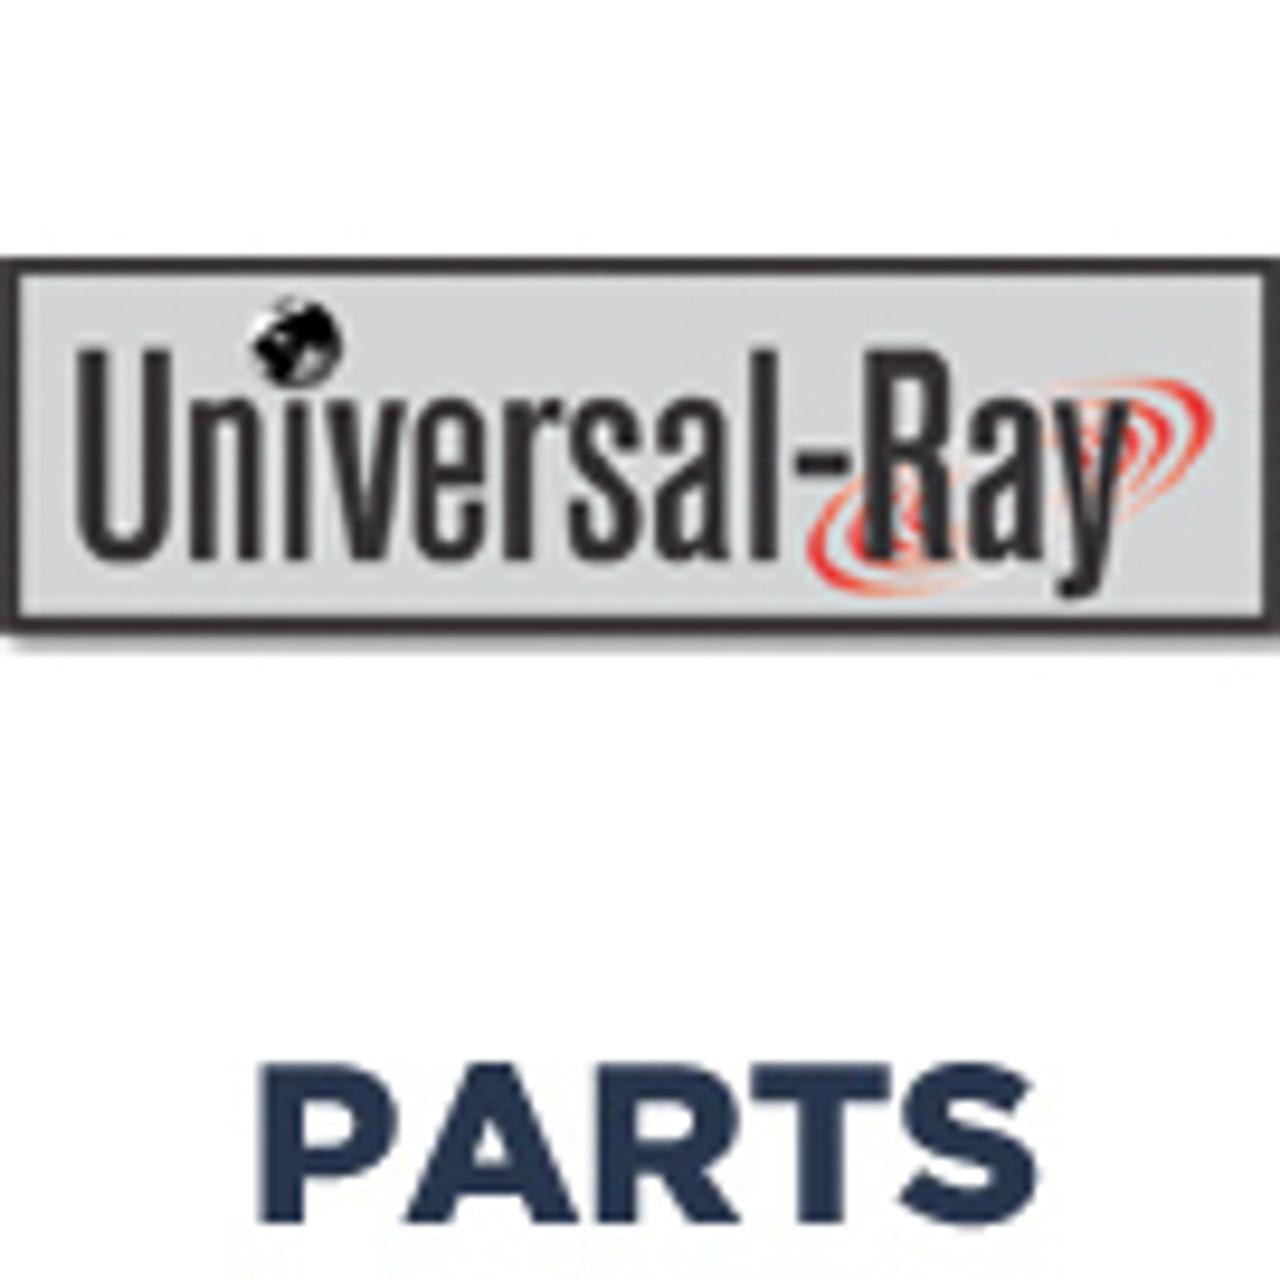 Universal-Ray Parts